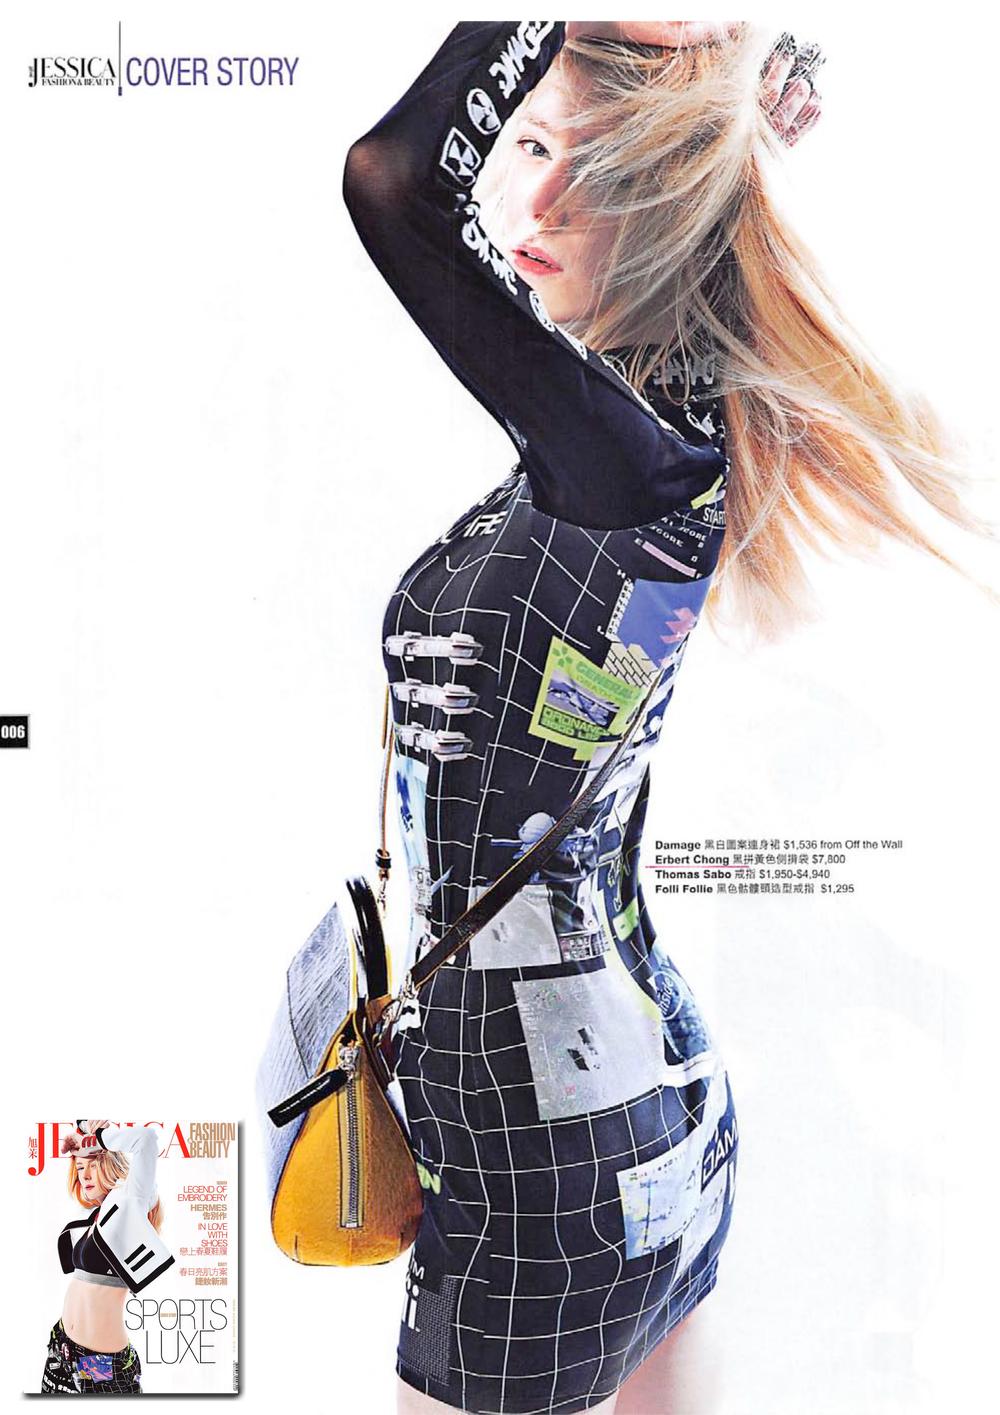 Jessica_MAR15.jpg